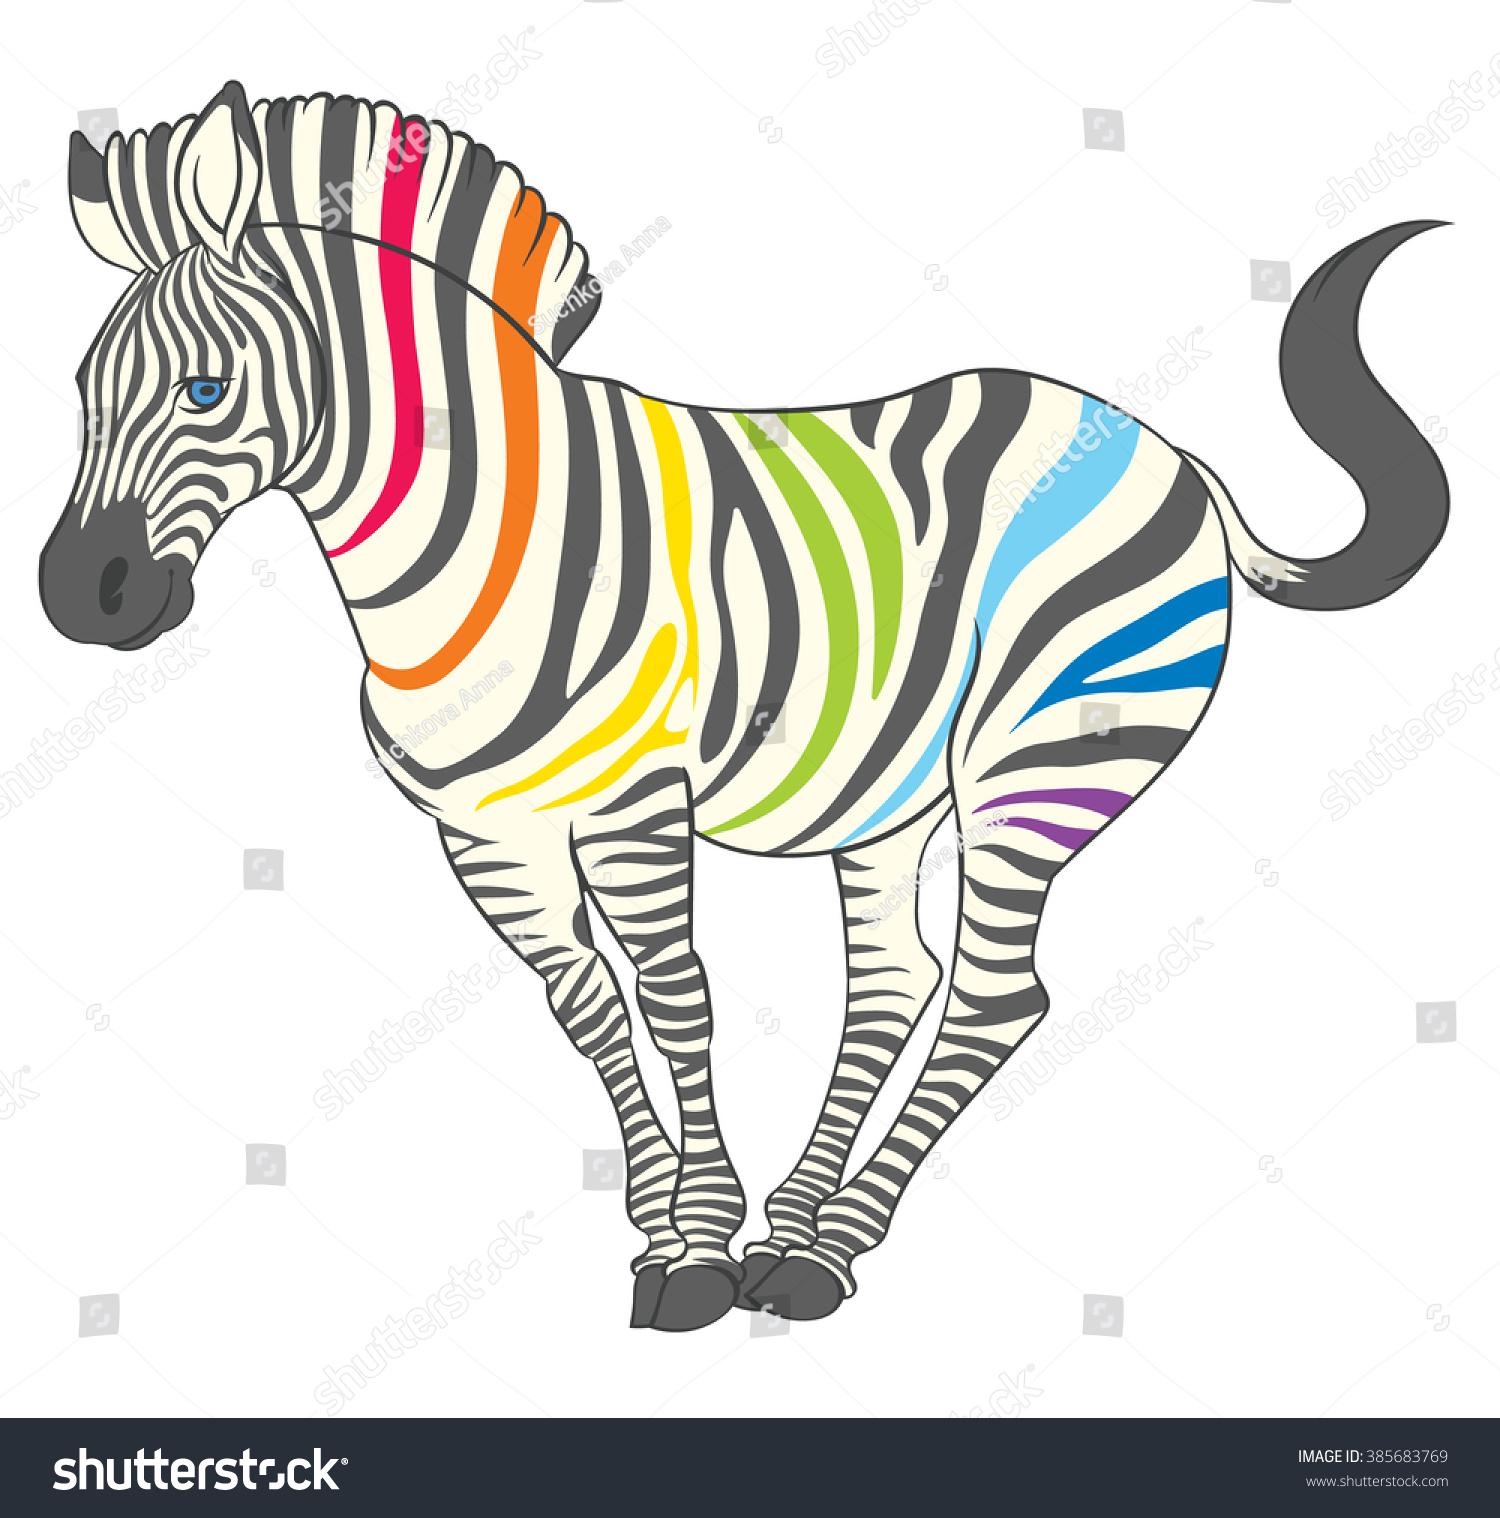 Line Drawing Rainbow : Cute naturalistic zebra rainbow stripes funny stock vector